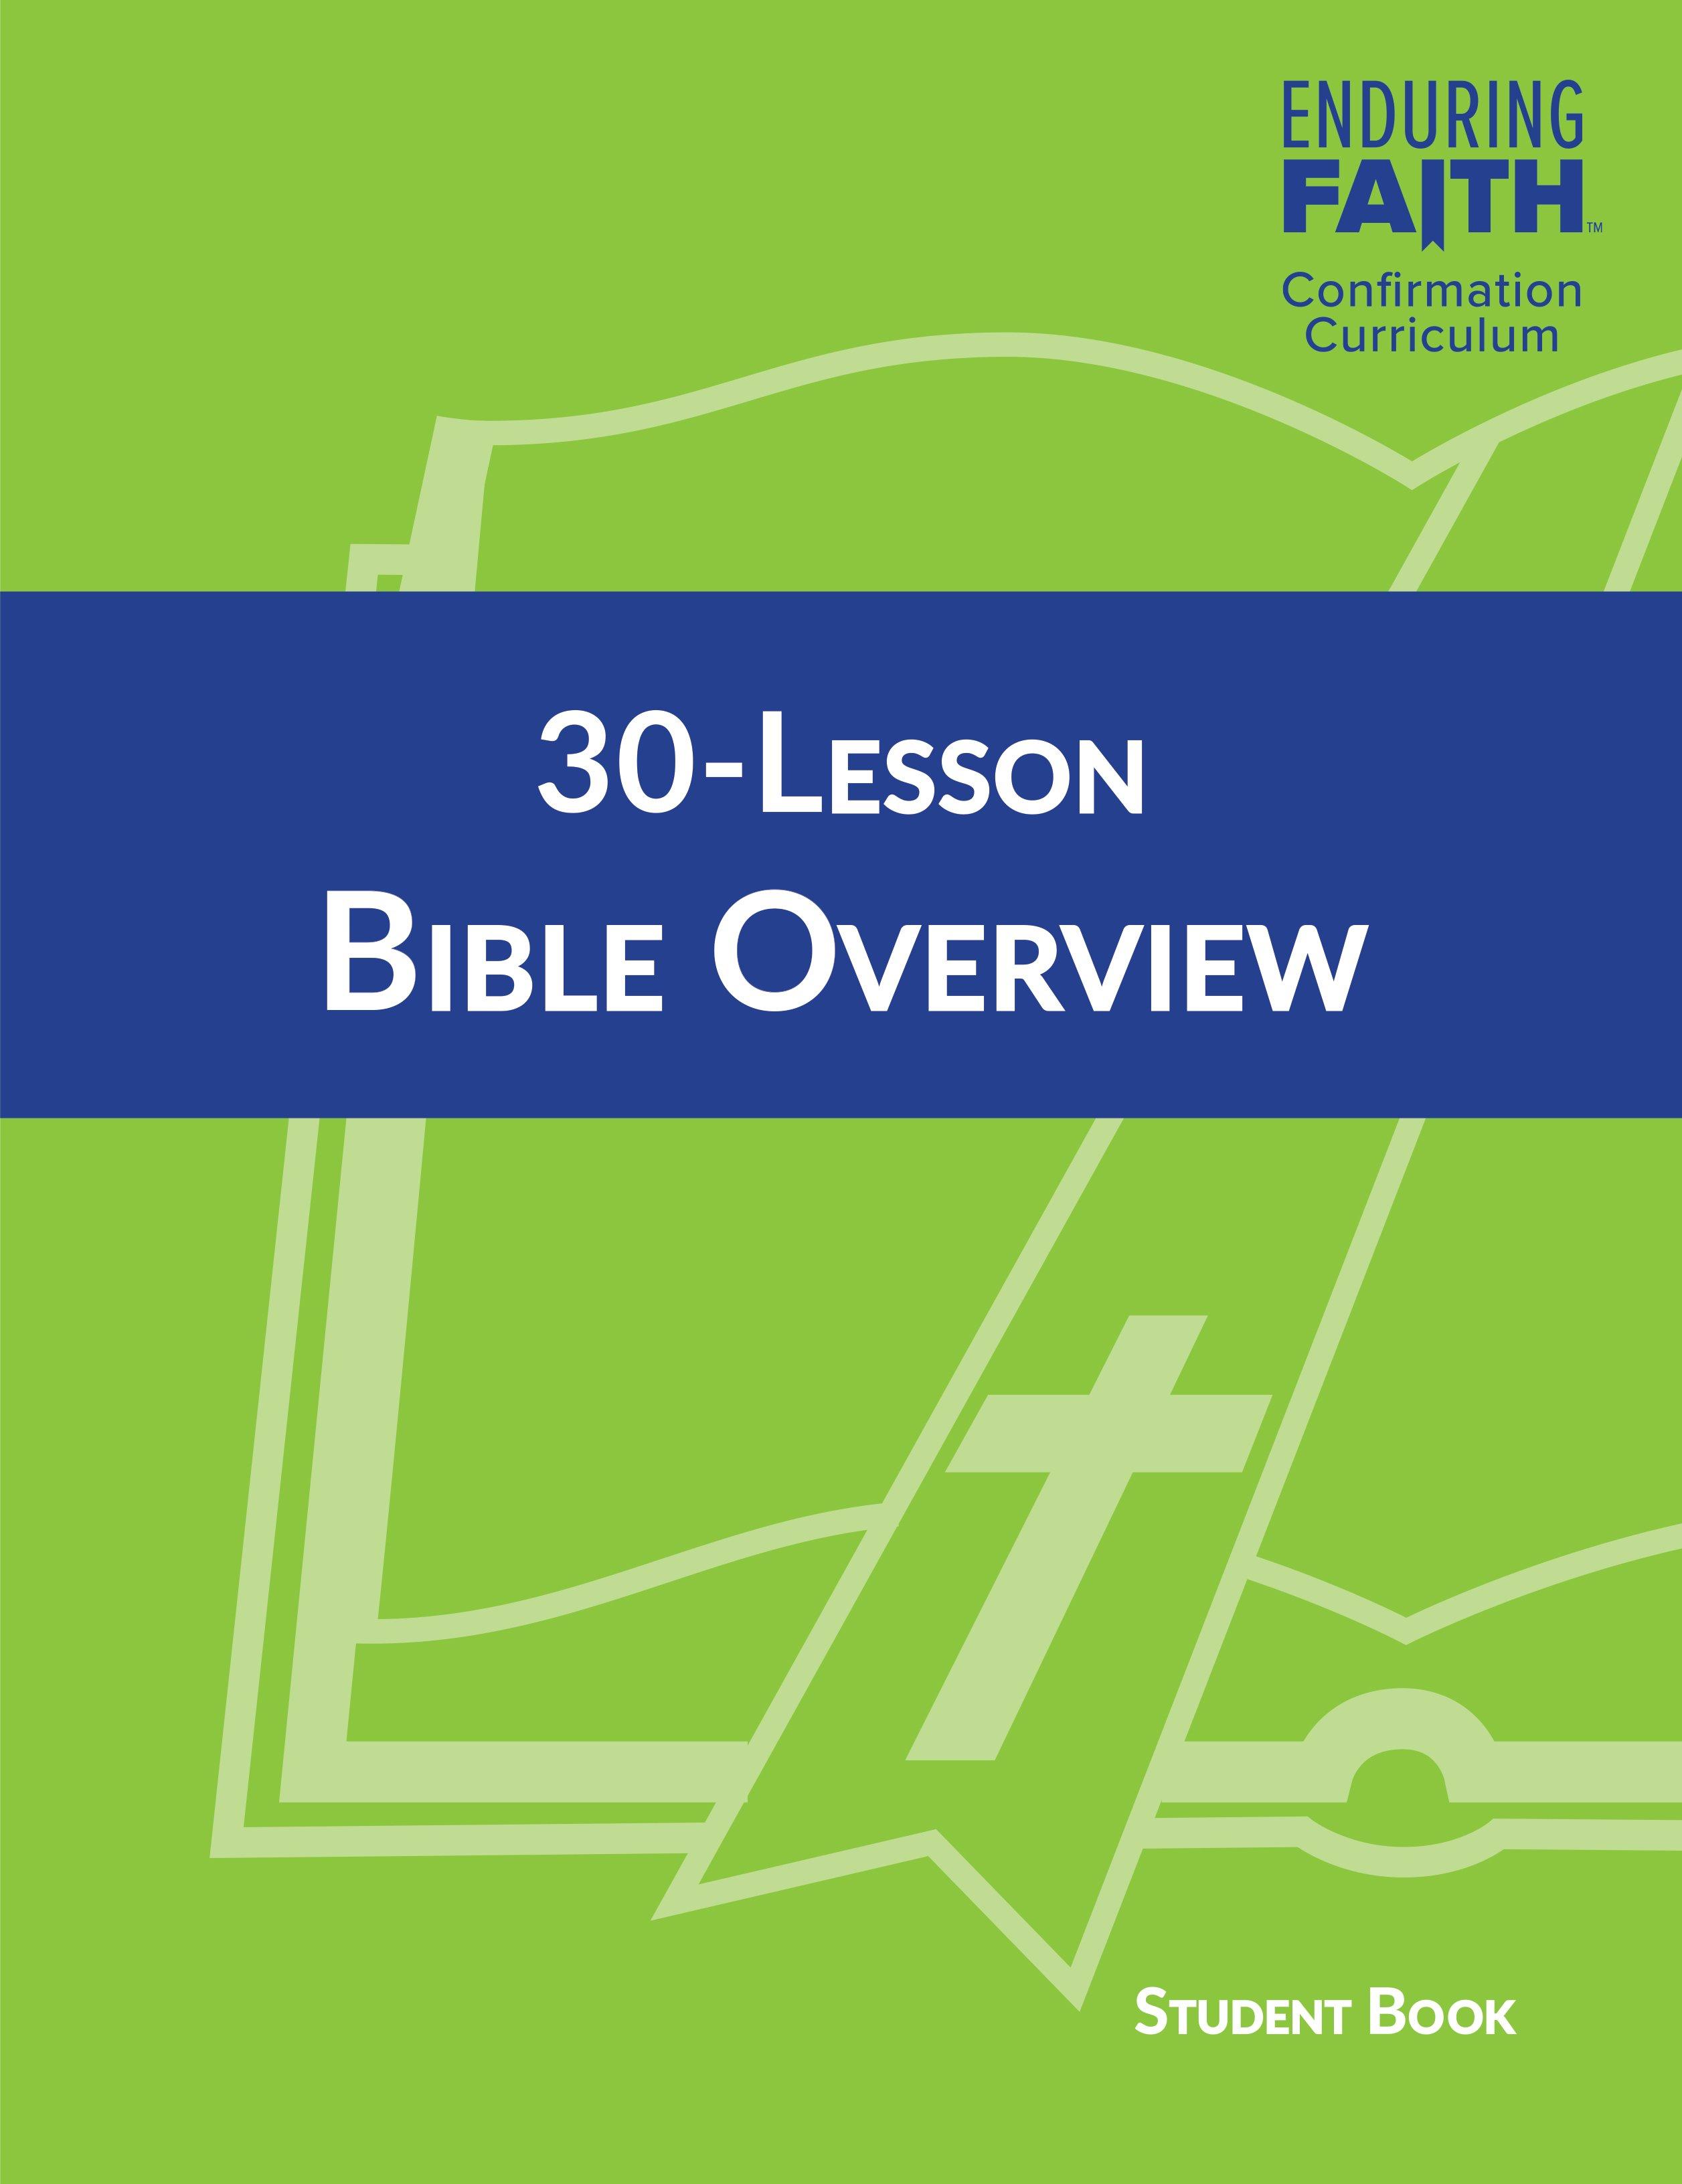 223210-BibleOverview-stud